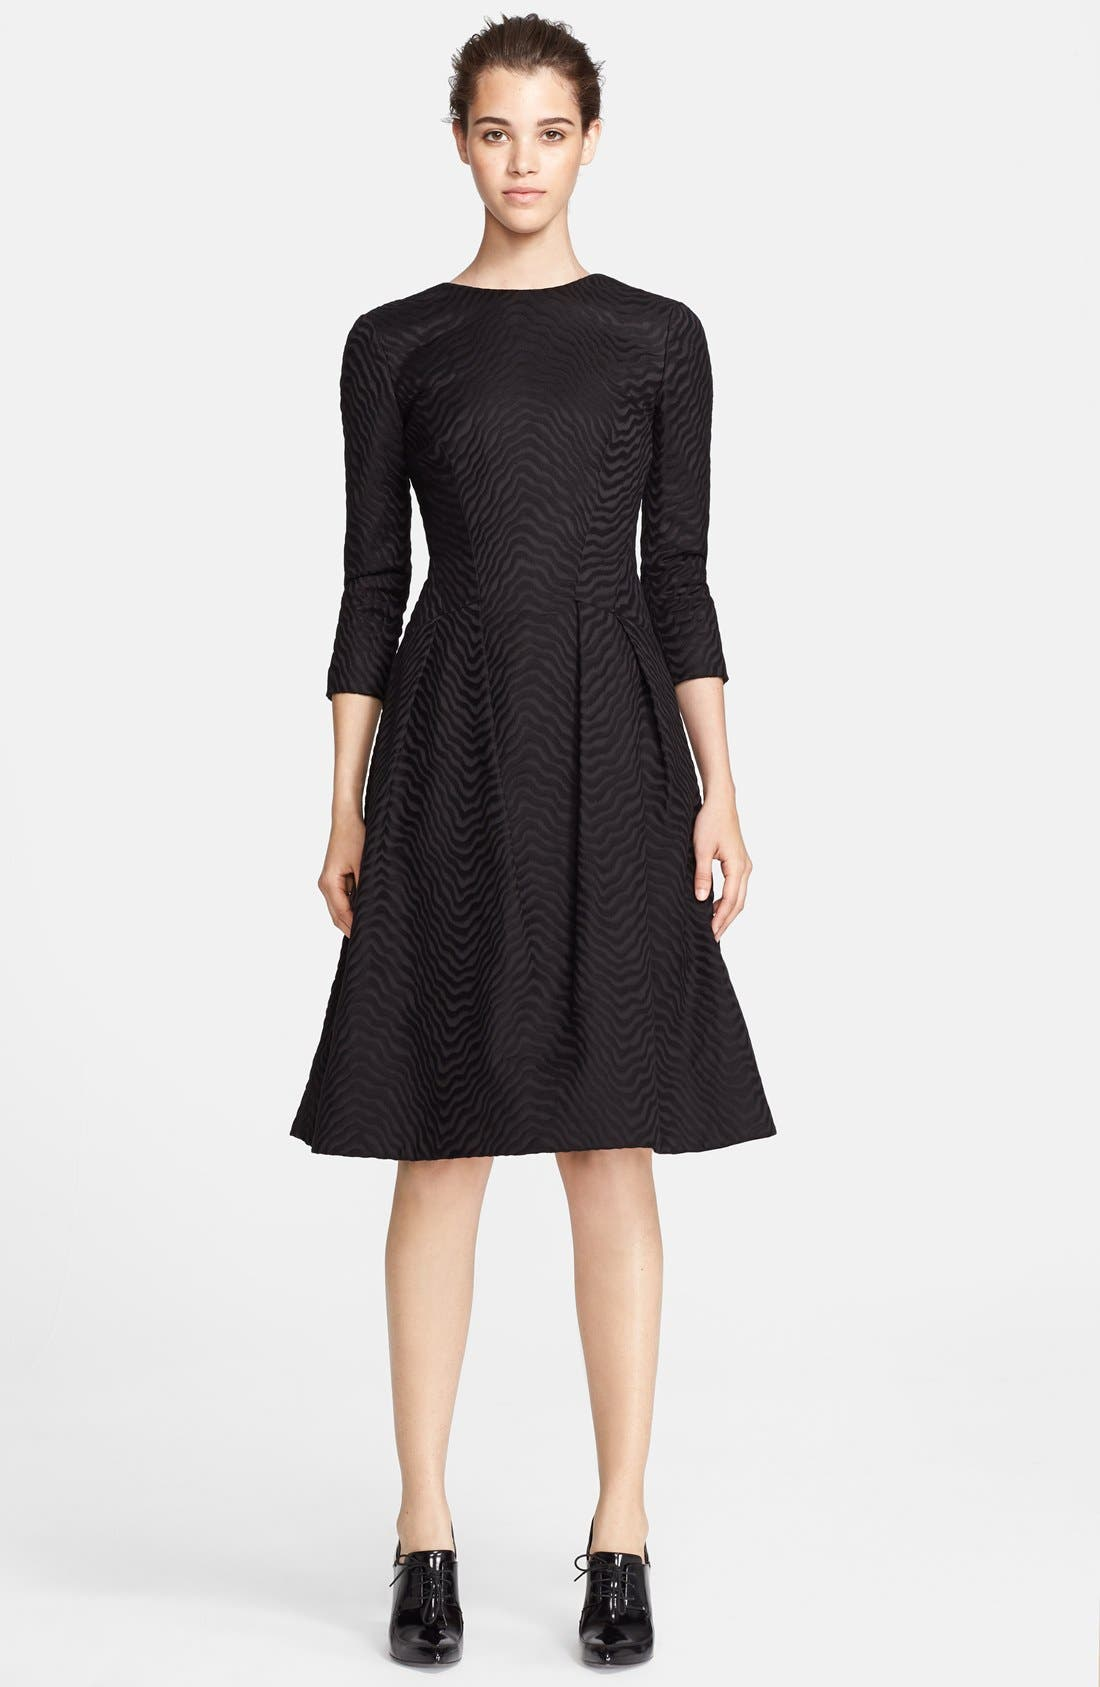 Alternate Image 1 Selected - Jason Wu Jacquard Fit & Flare Dress